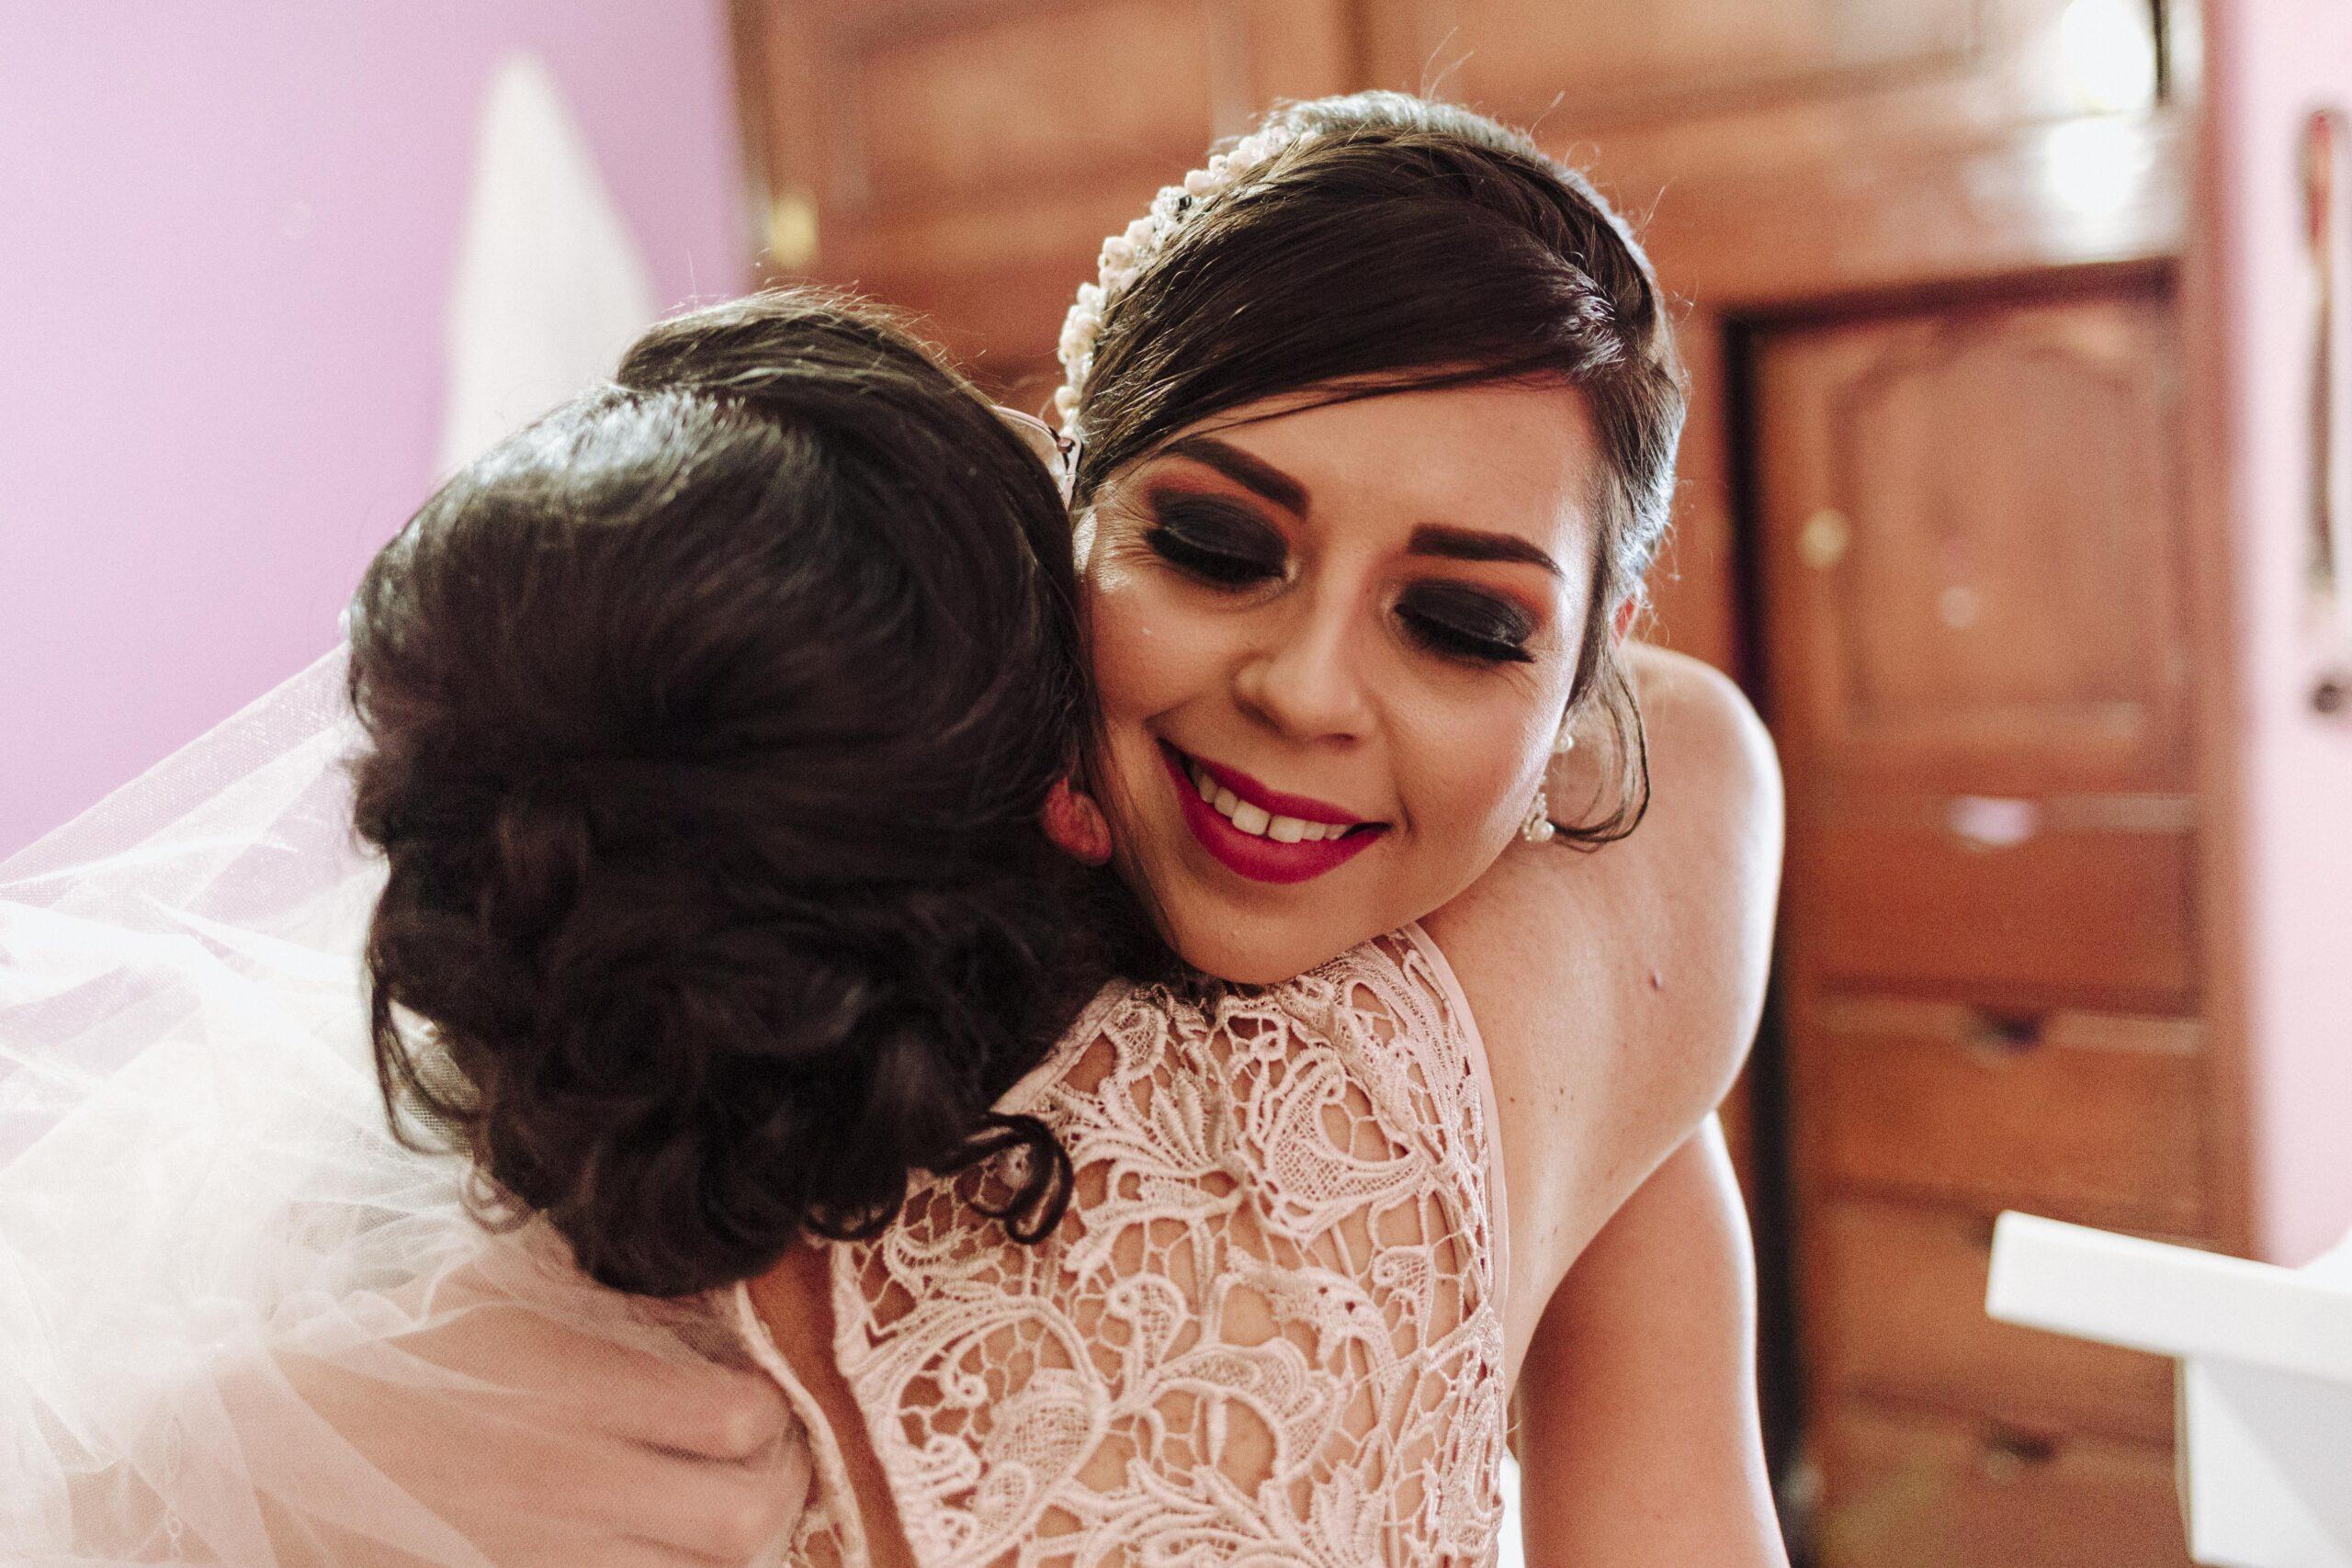 javier_noriega_fotografo_profesional_zacatecas_mexico_chihuahua_photographer6